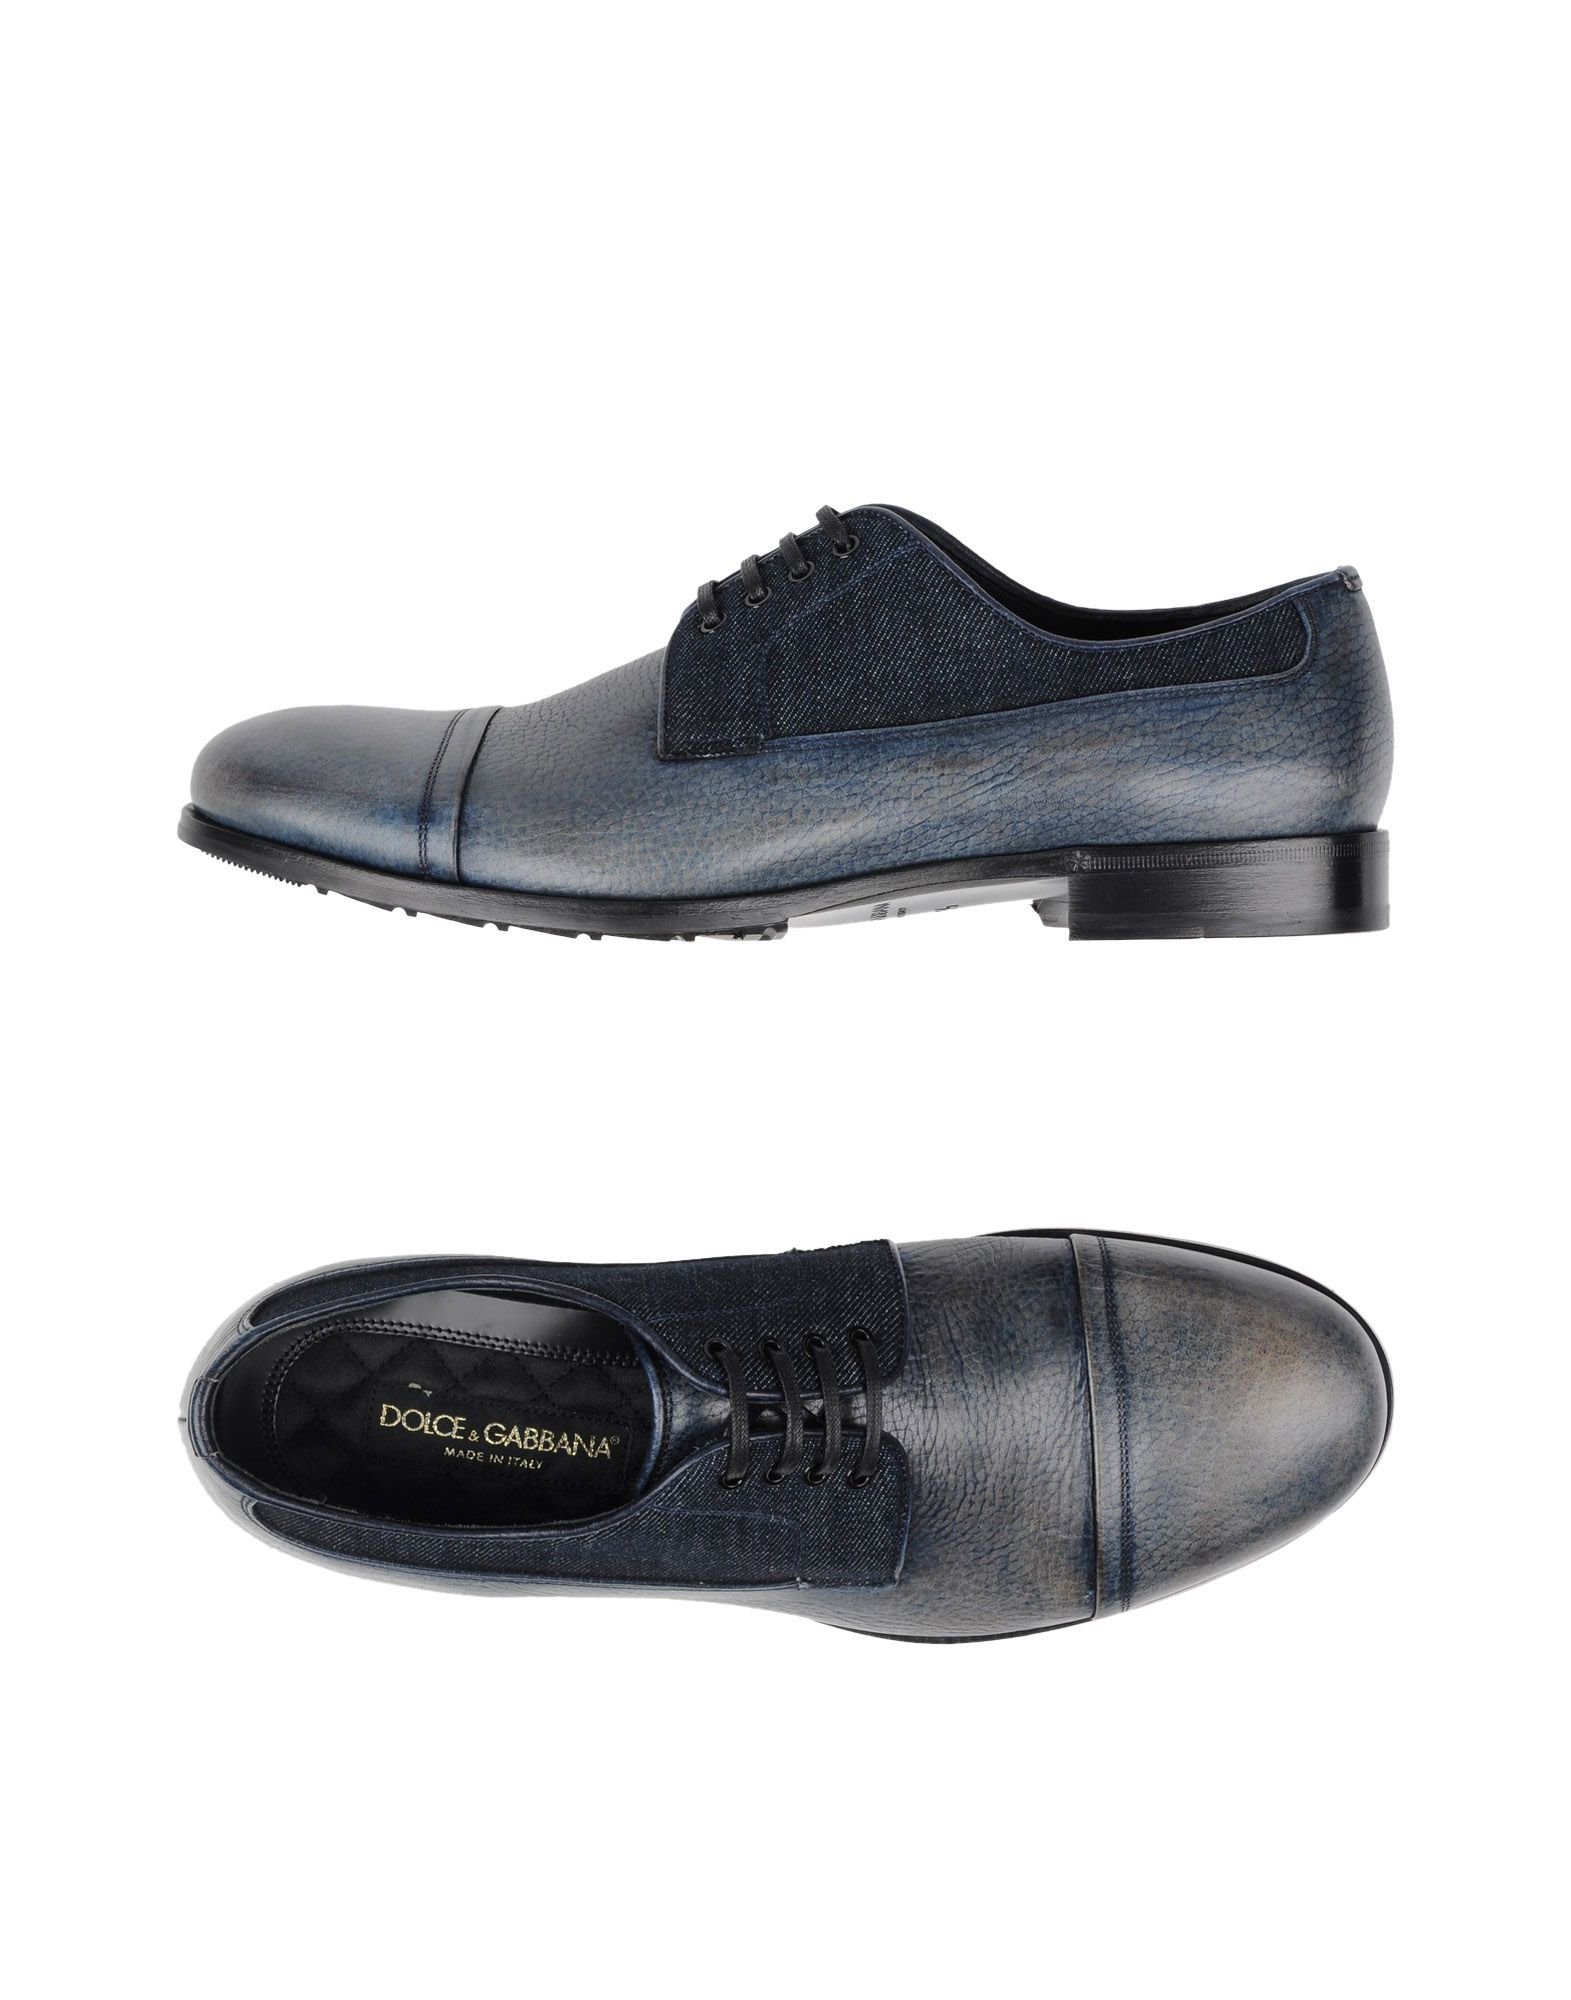 Stringate Dolce & Gabbana Uomo 11146860KD - 11146860KD Uomo 5931de